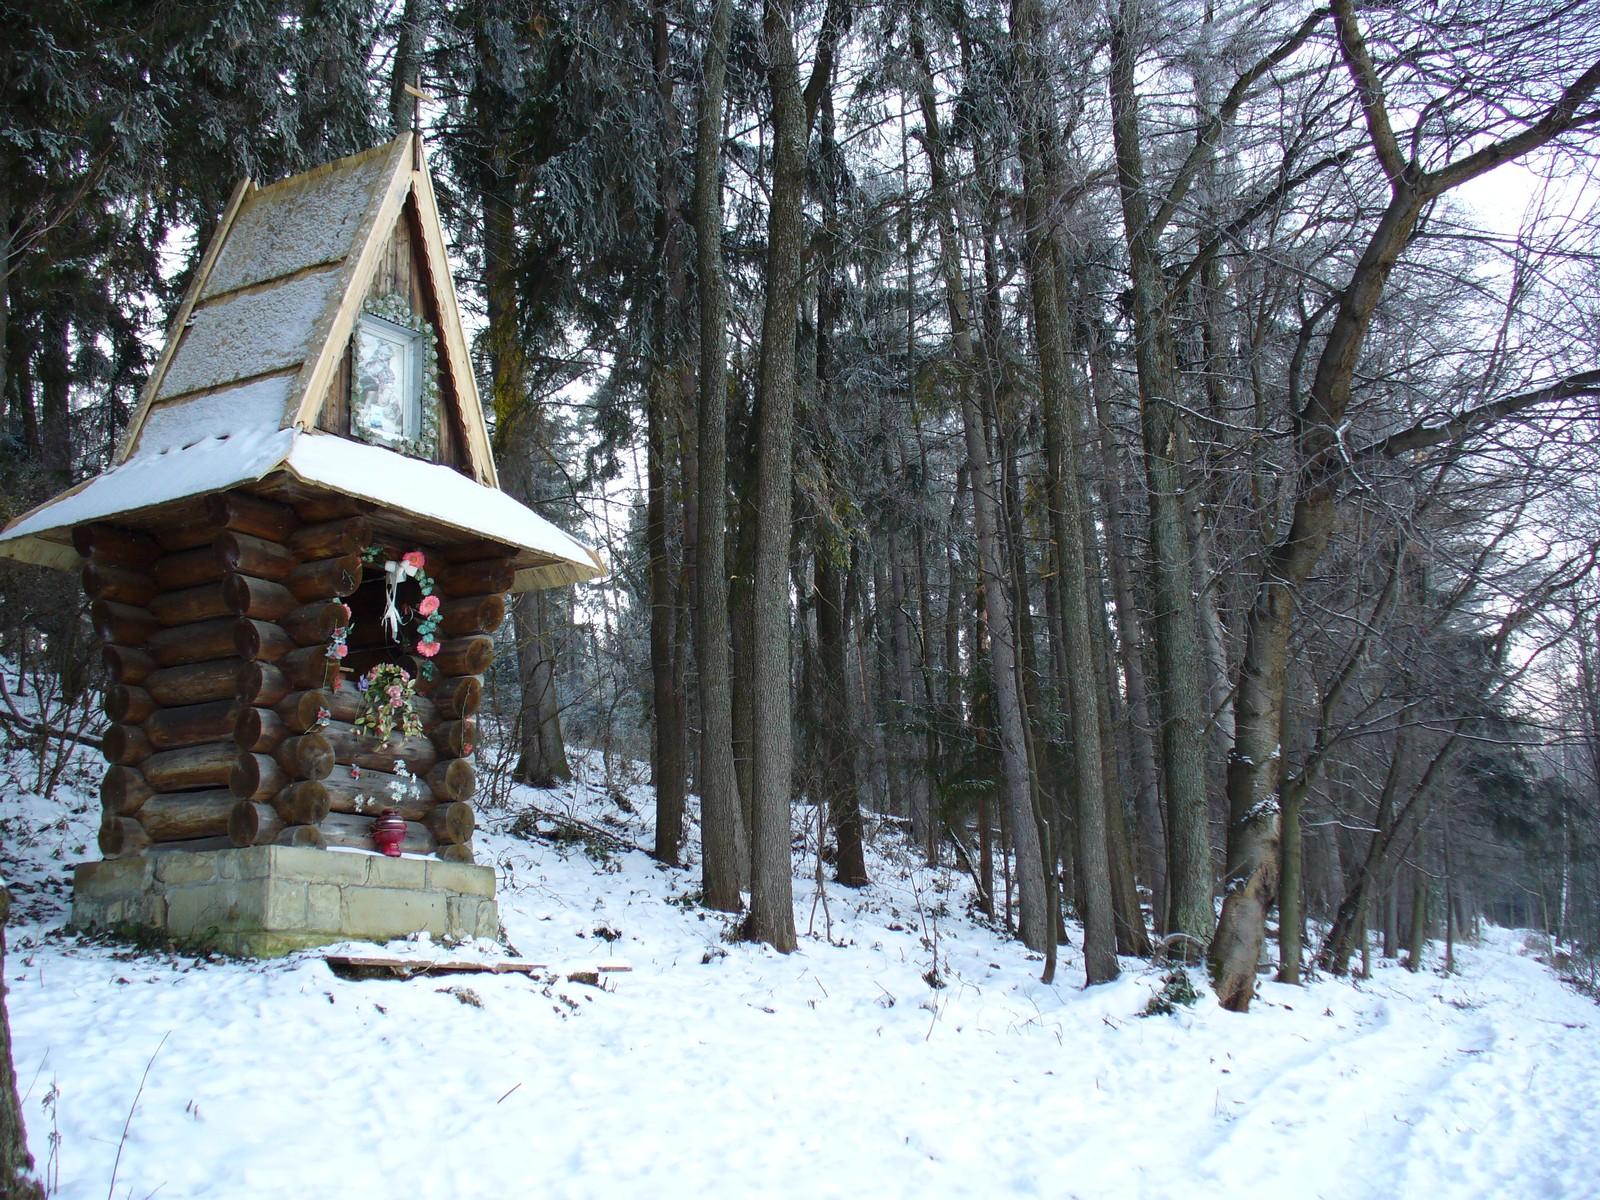 Kapliczka na skraju lasu